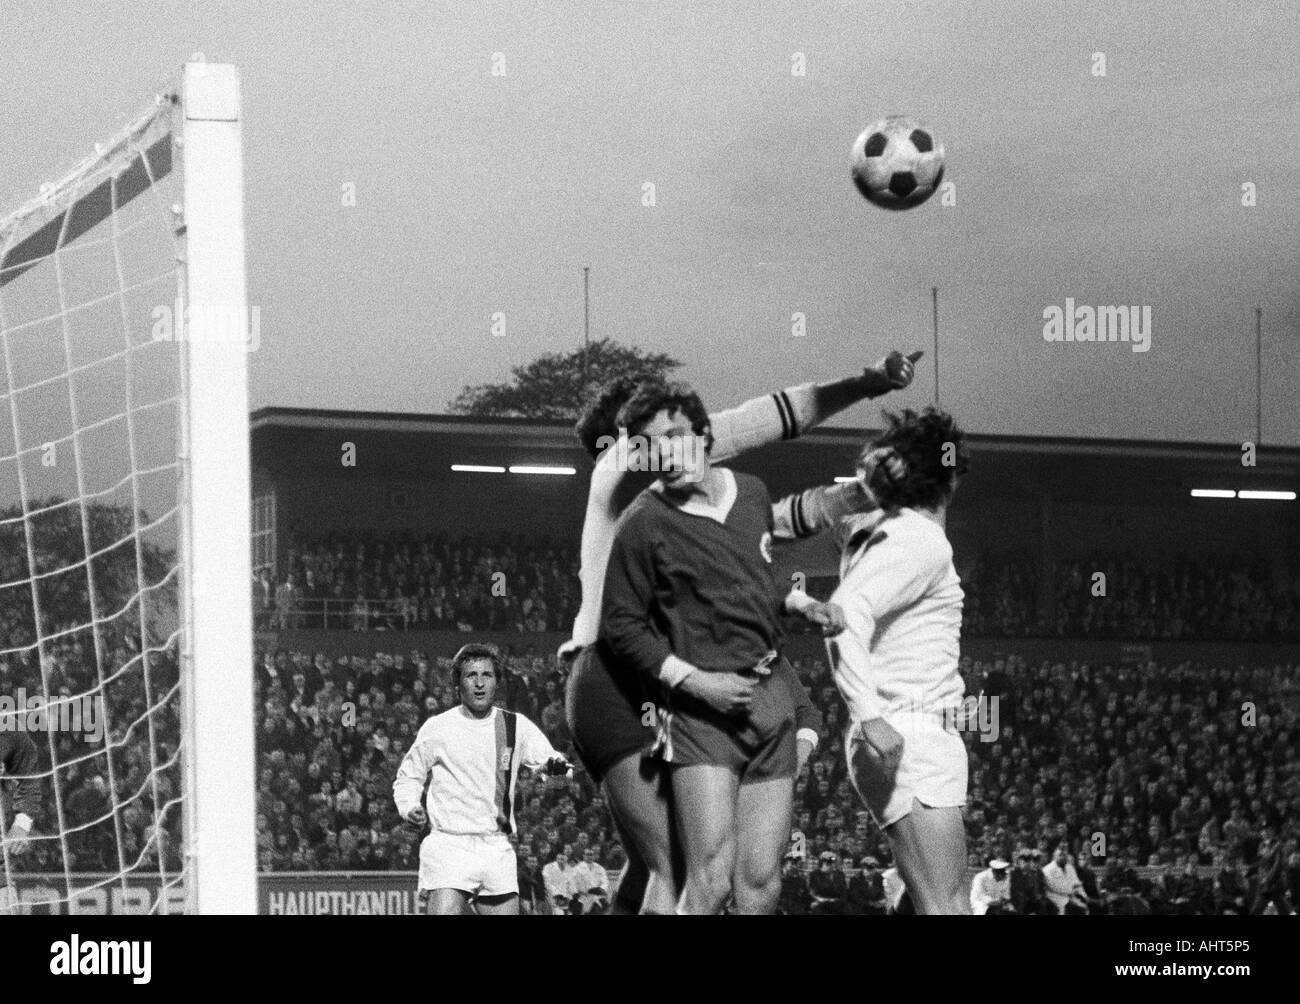 football, Bundesliga, 1970/1971, Rot-Weiss Oberhausen versus Borussia Moenchengladbach 0:2, Niederrhein Stadium in Oberhausen, scene of the match, f.l.t.r. Hans Juergen Wloka (MG), keeper Wolfgang Scheid, Reiner Hollmann (both RWO), Jupp Heynckes (MG) - Stock Image